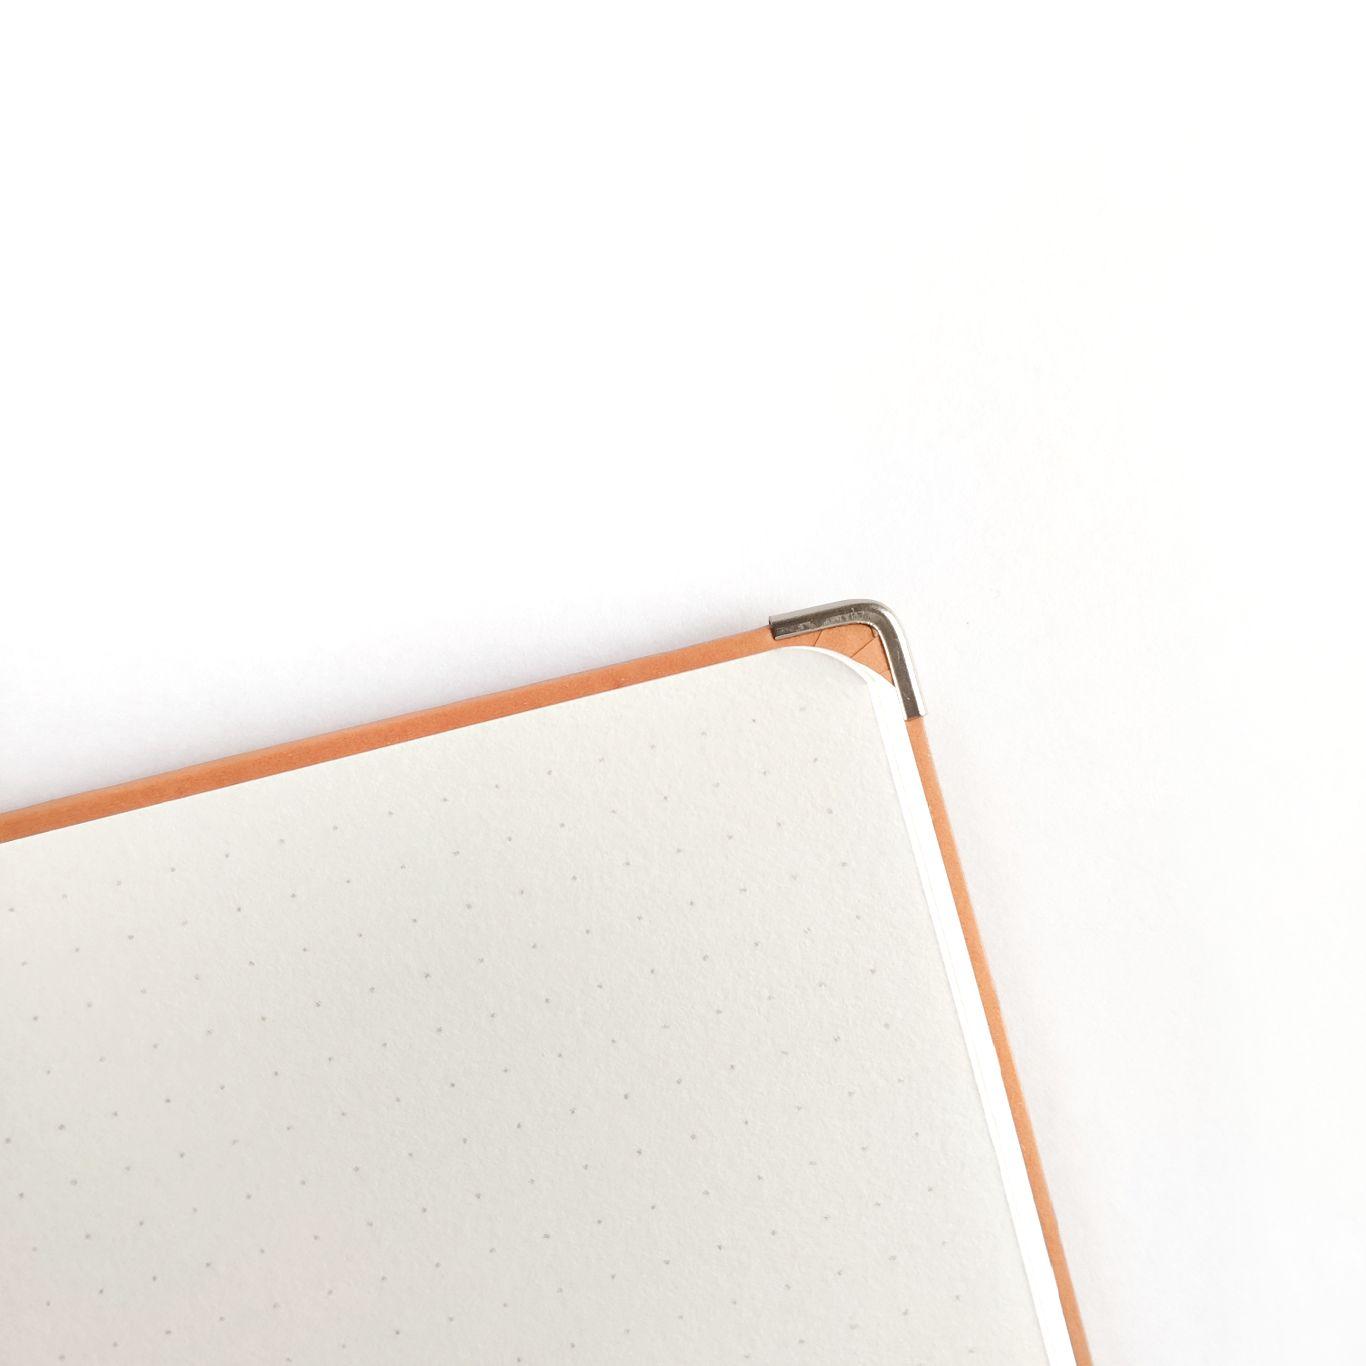 wabi sabi - caderneta lombada florida caramelo 120 g/m²